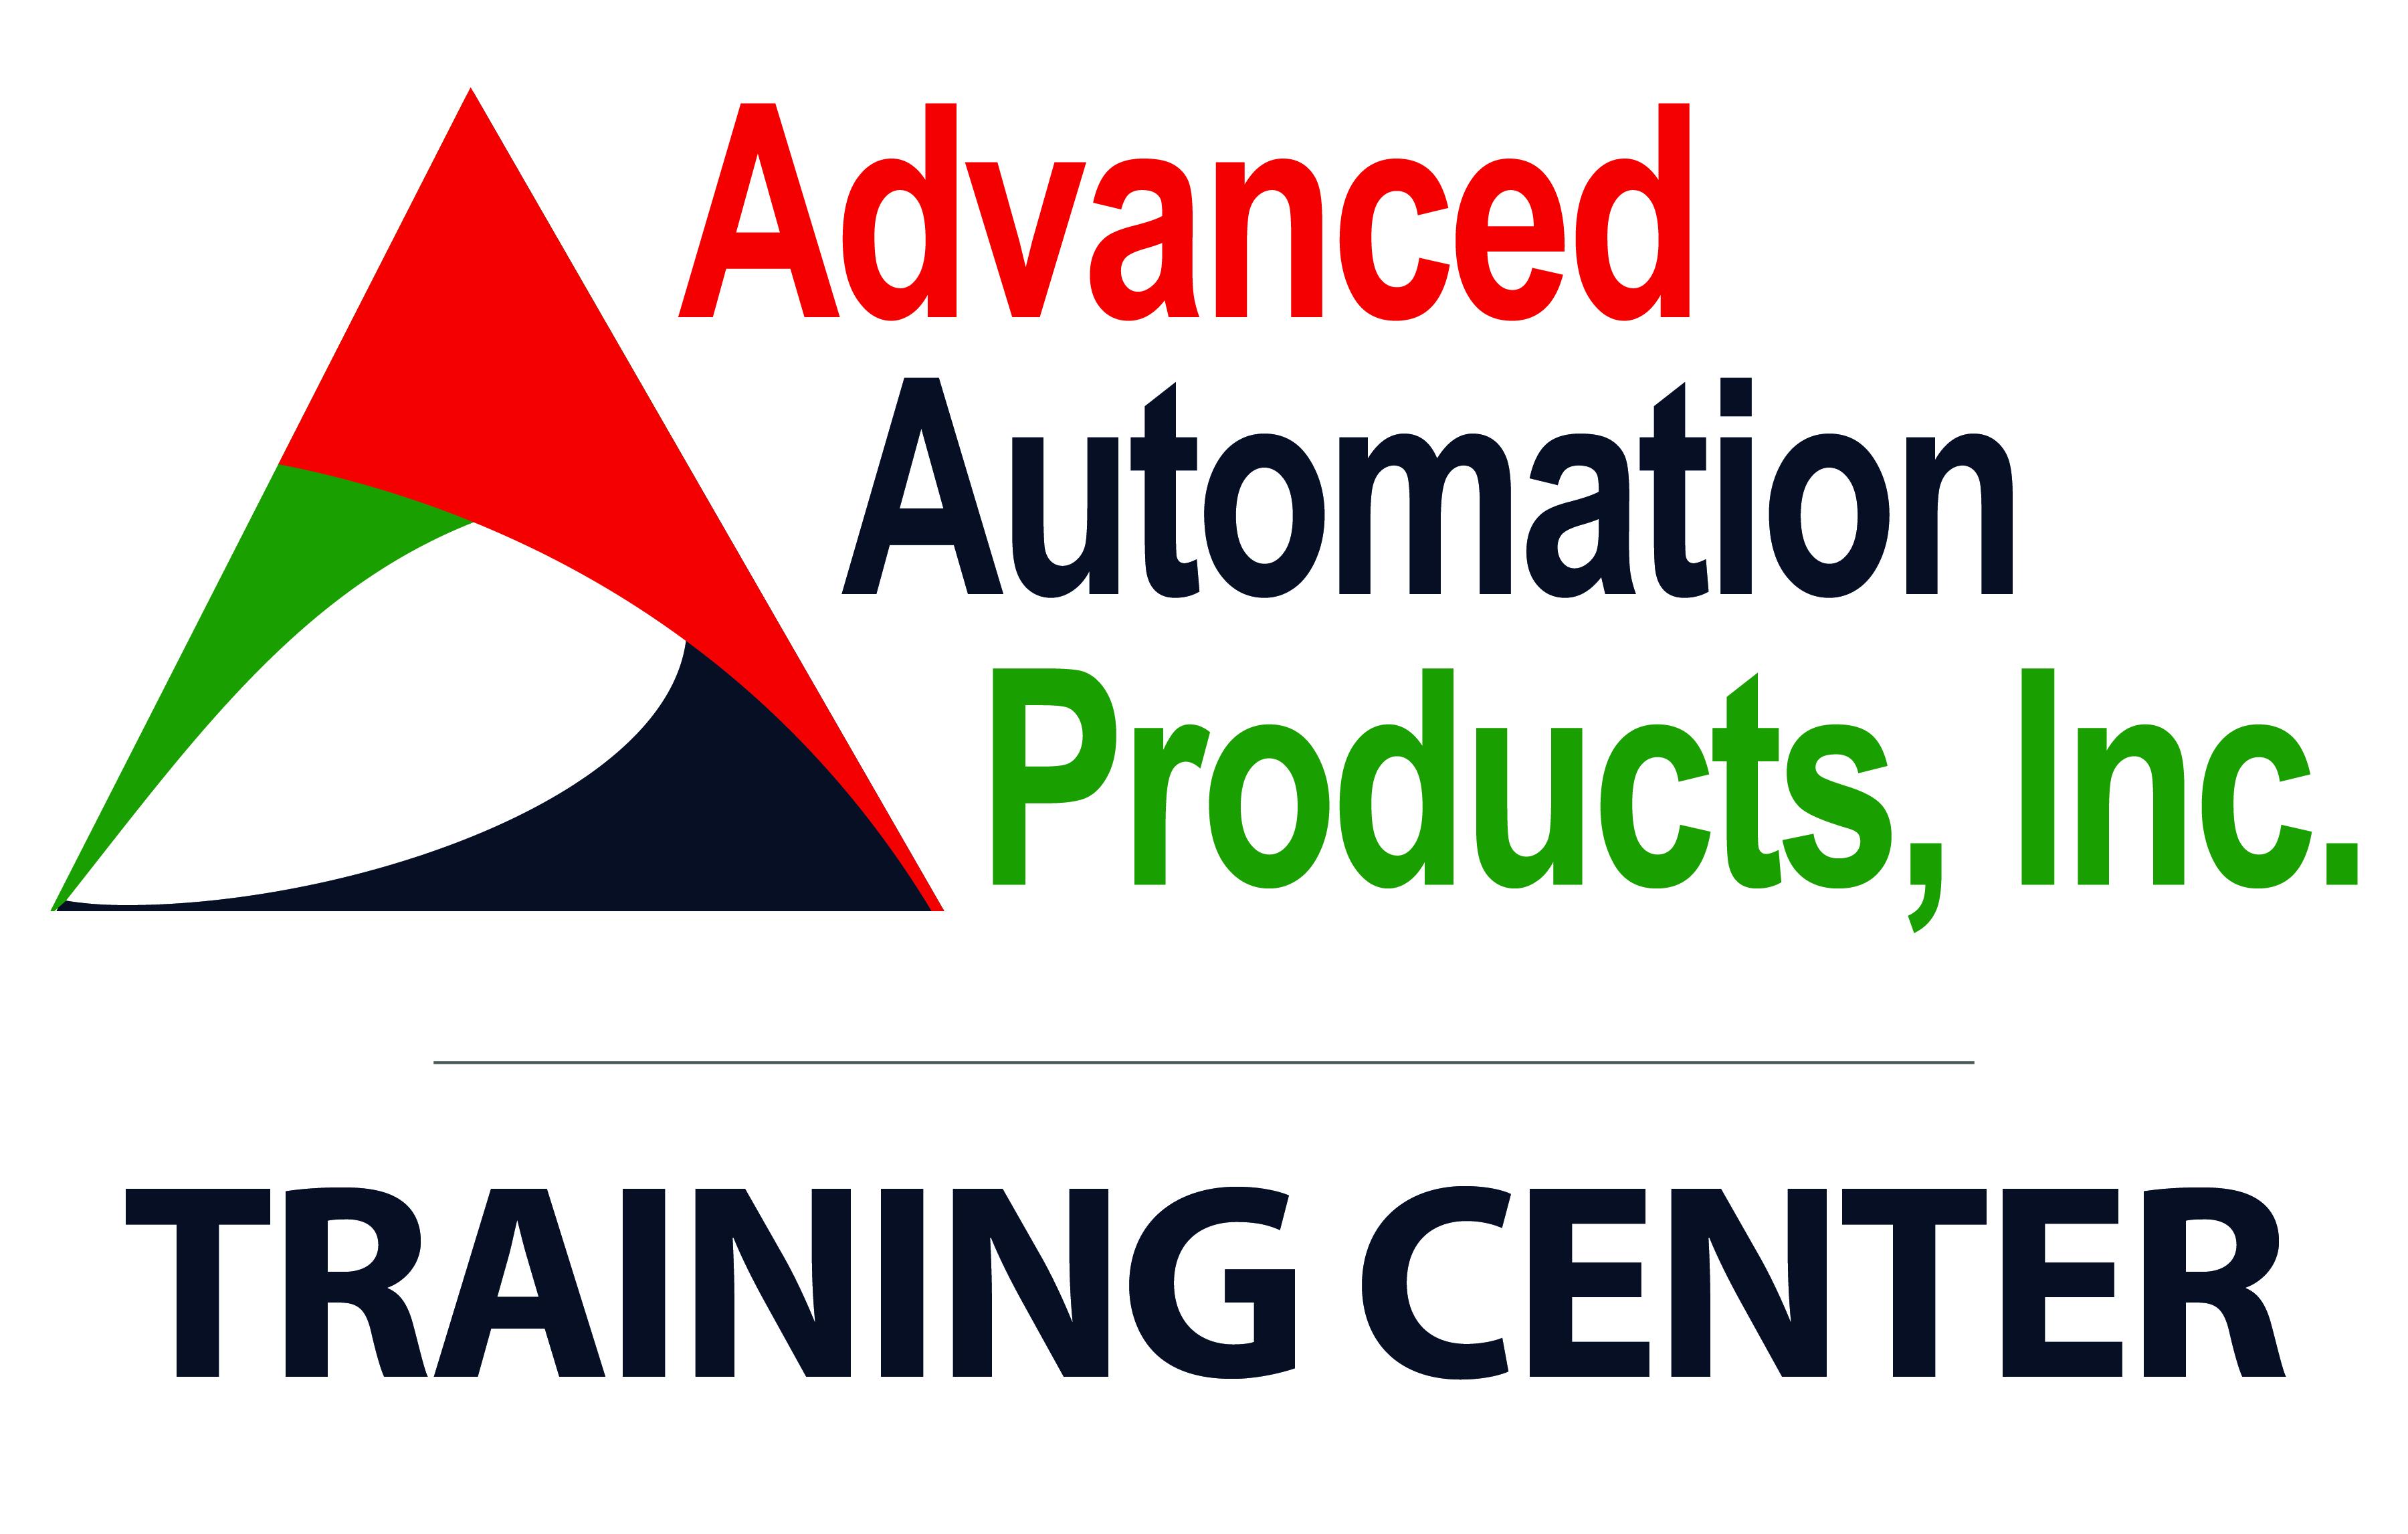 AAP Training Center